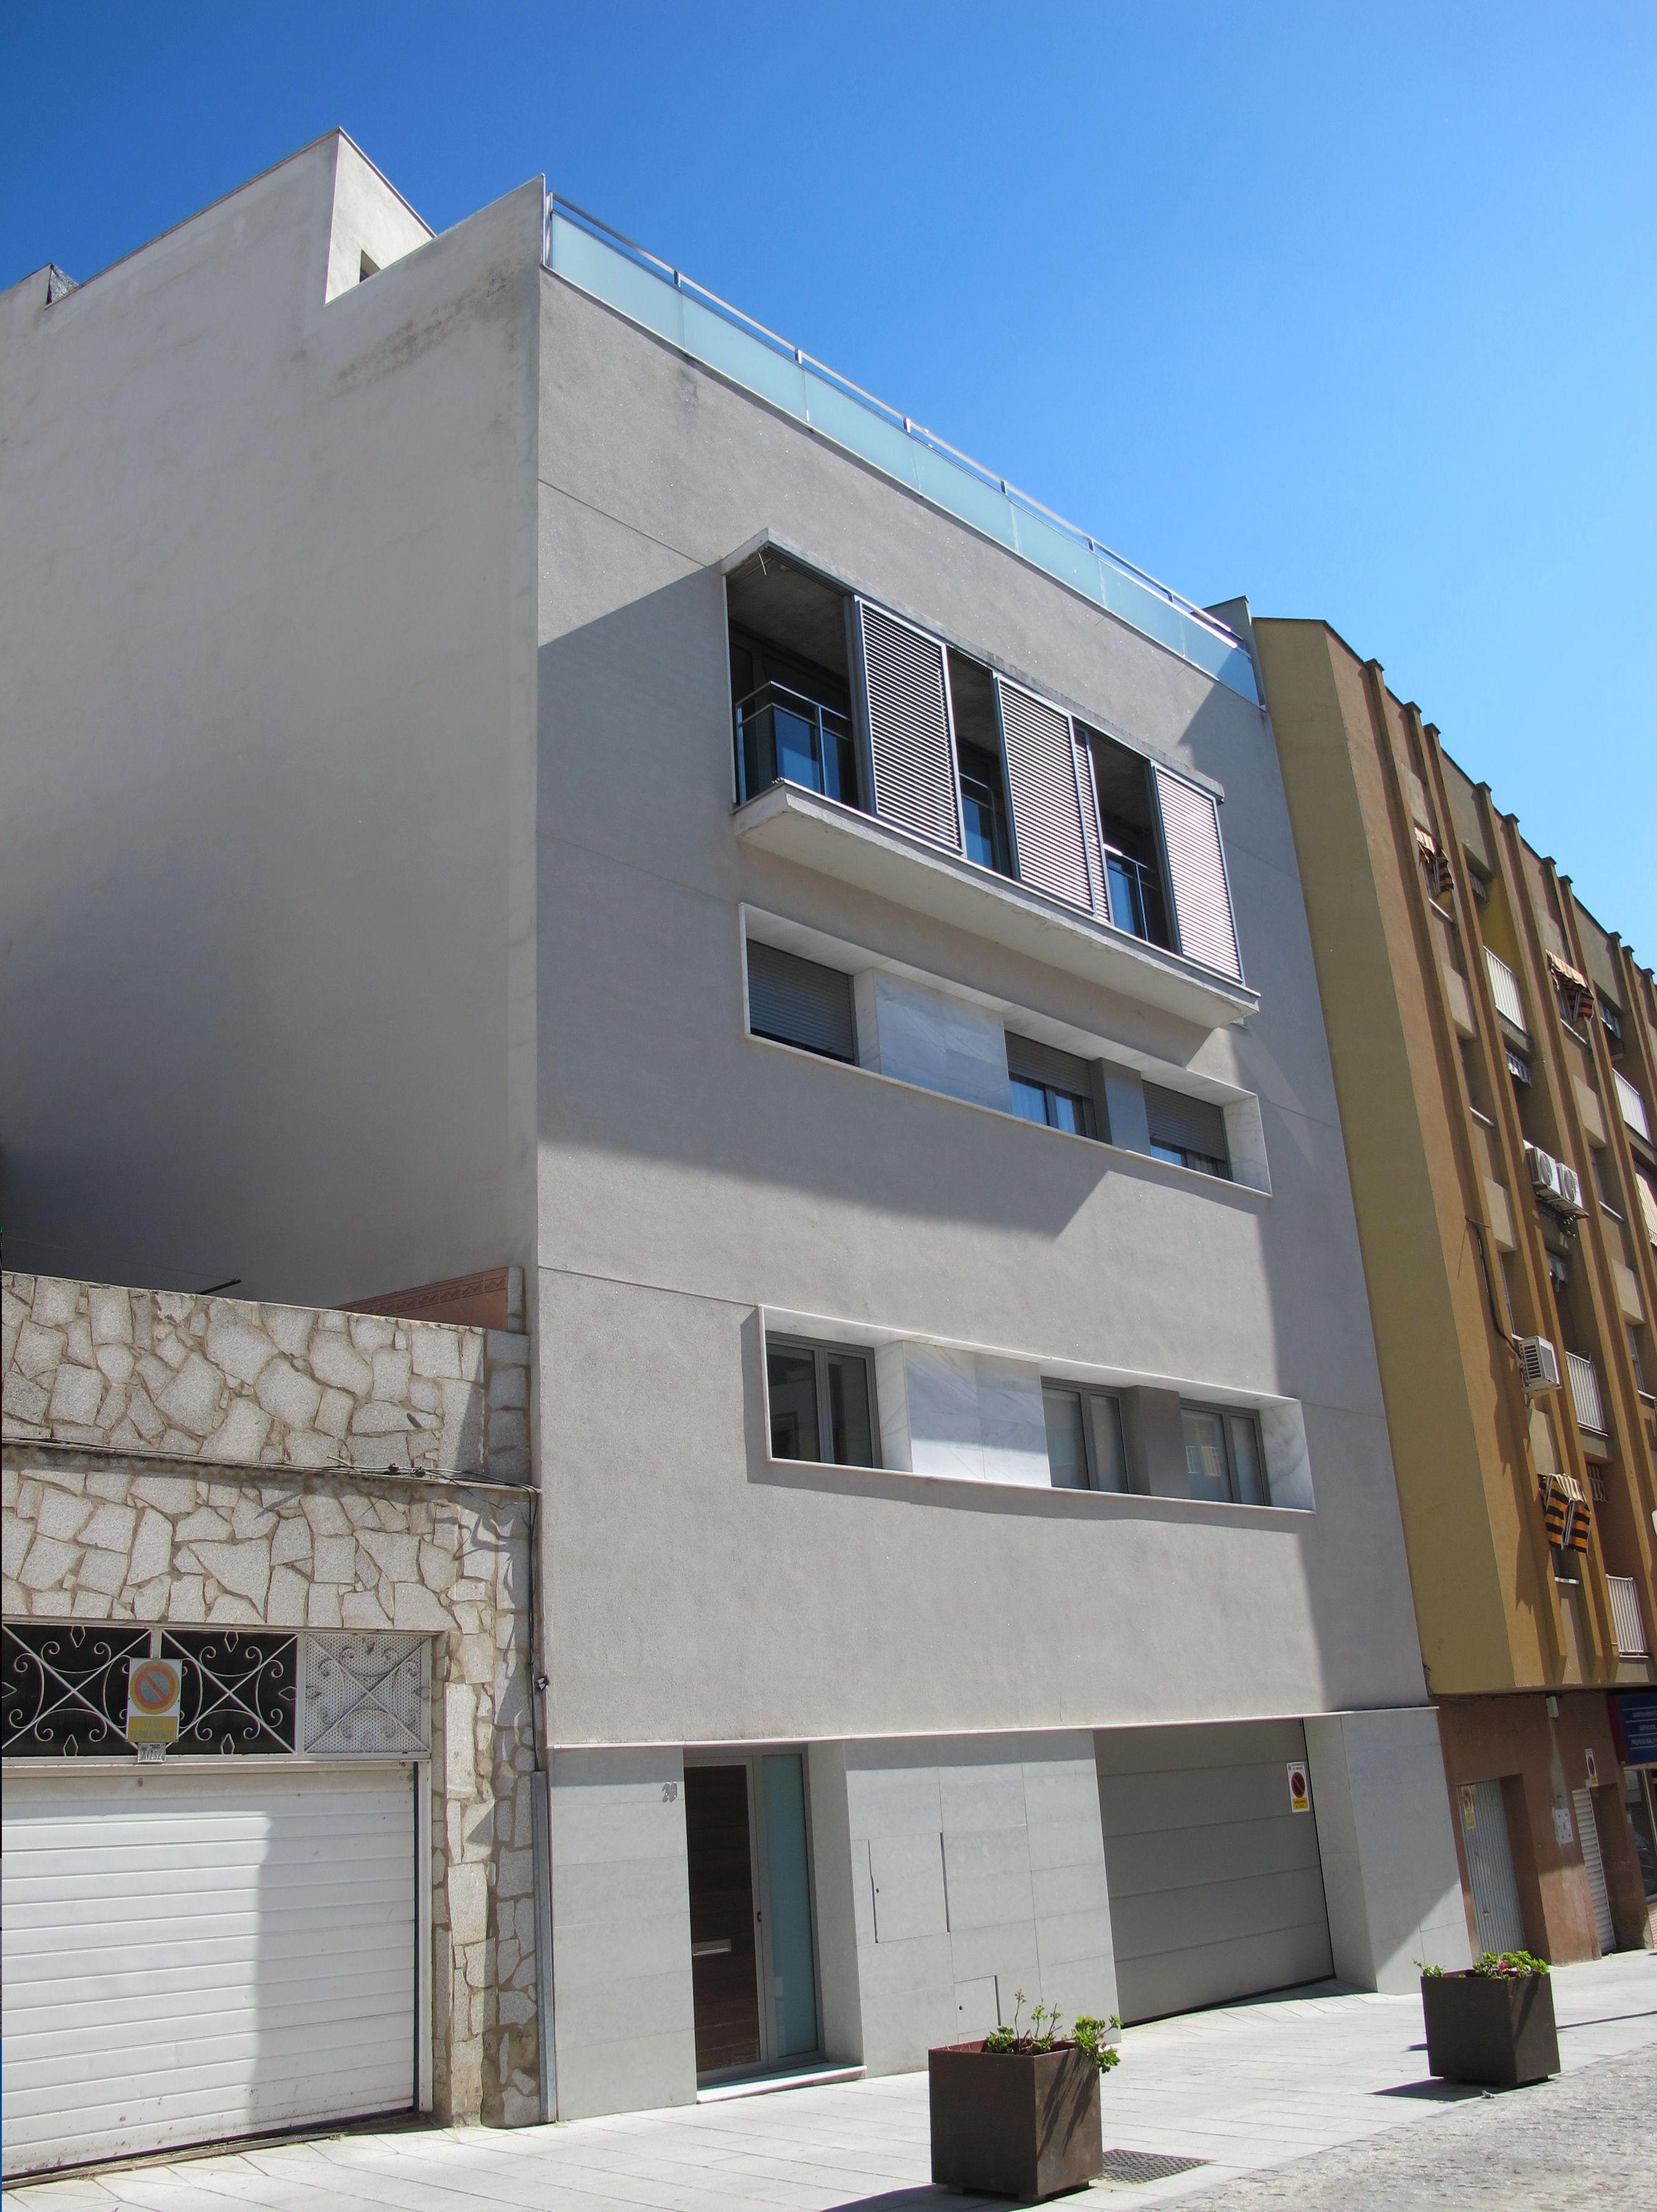 Vivienda en calle Morería de Mérida